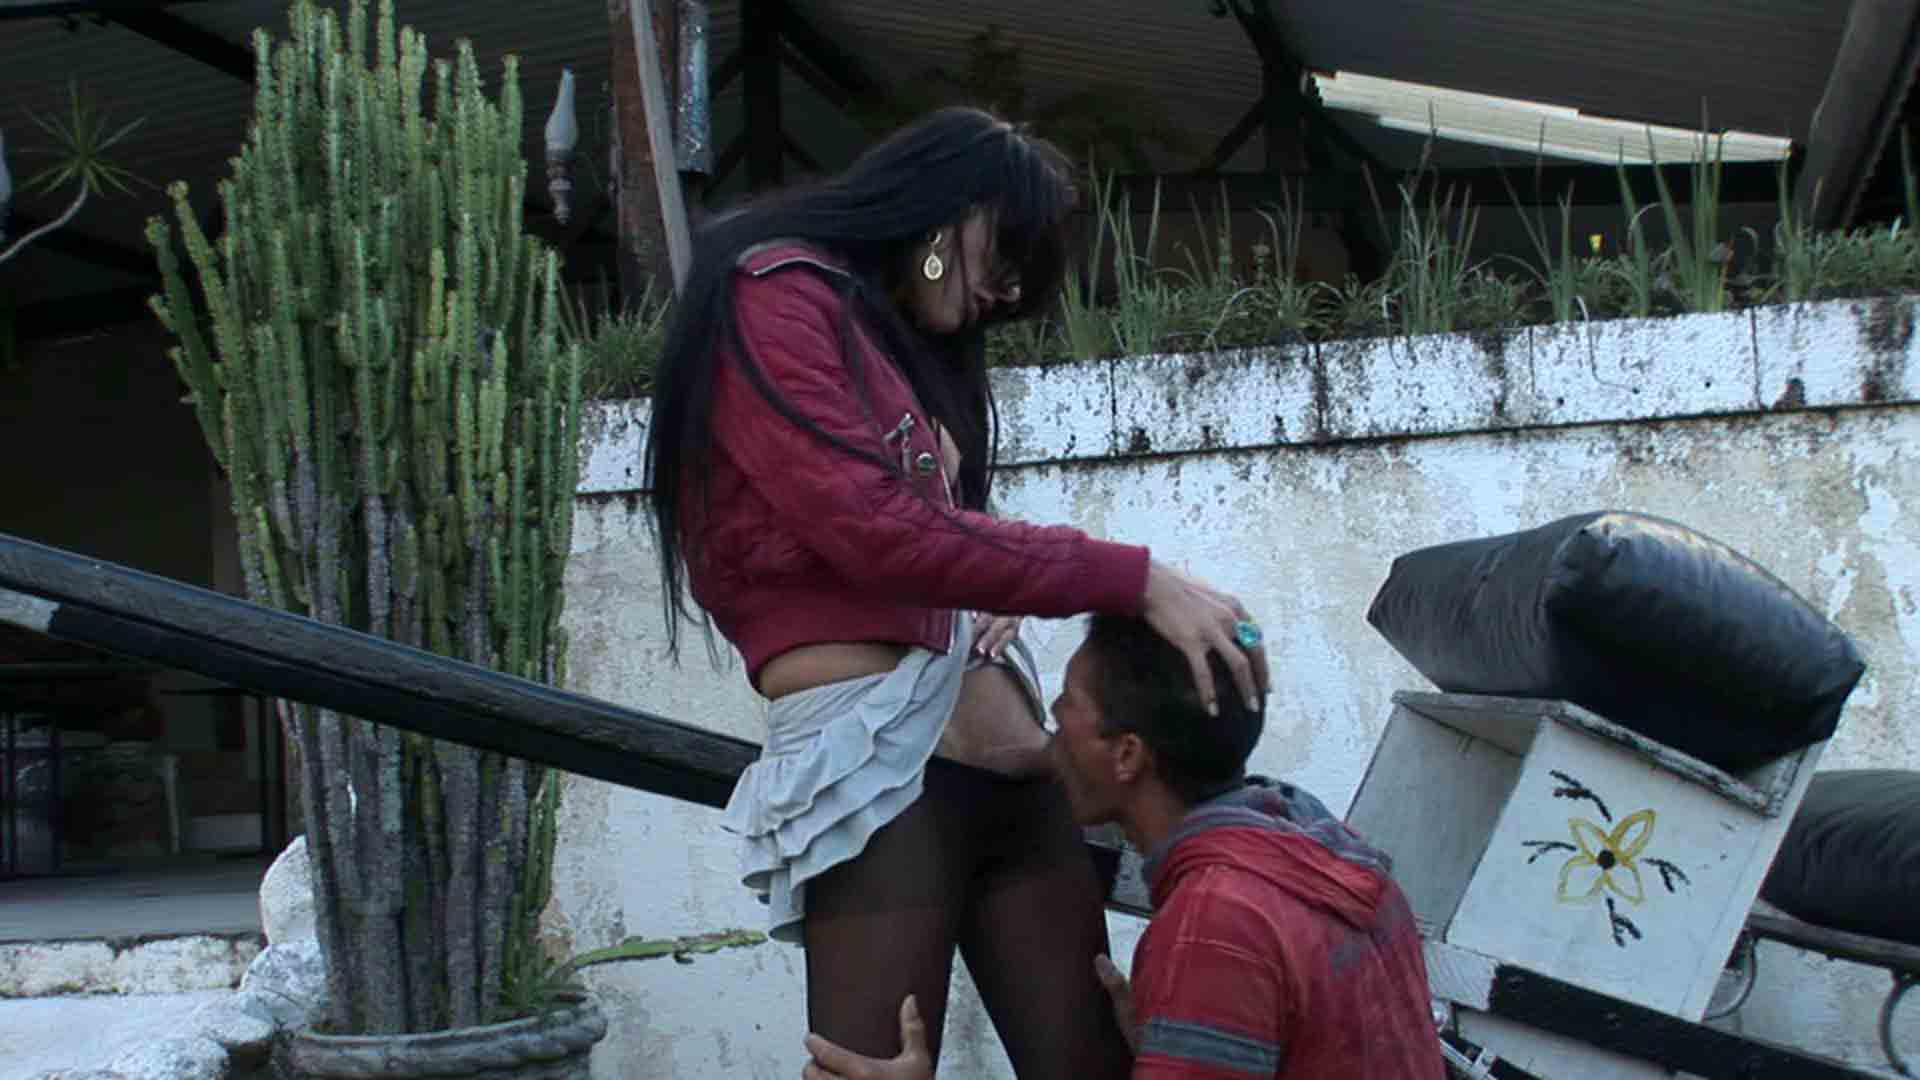 Viviane and Flavio shemale dicking guy on